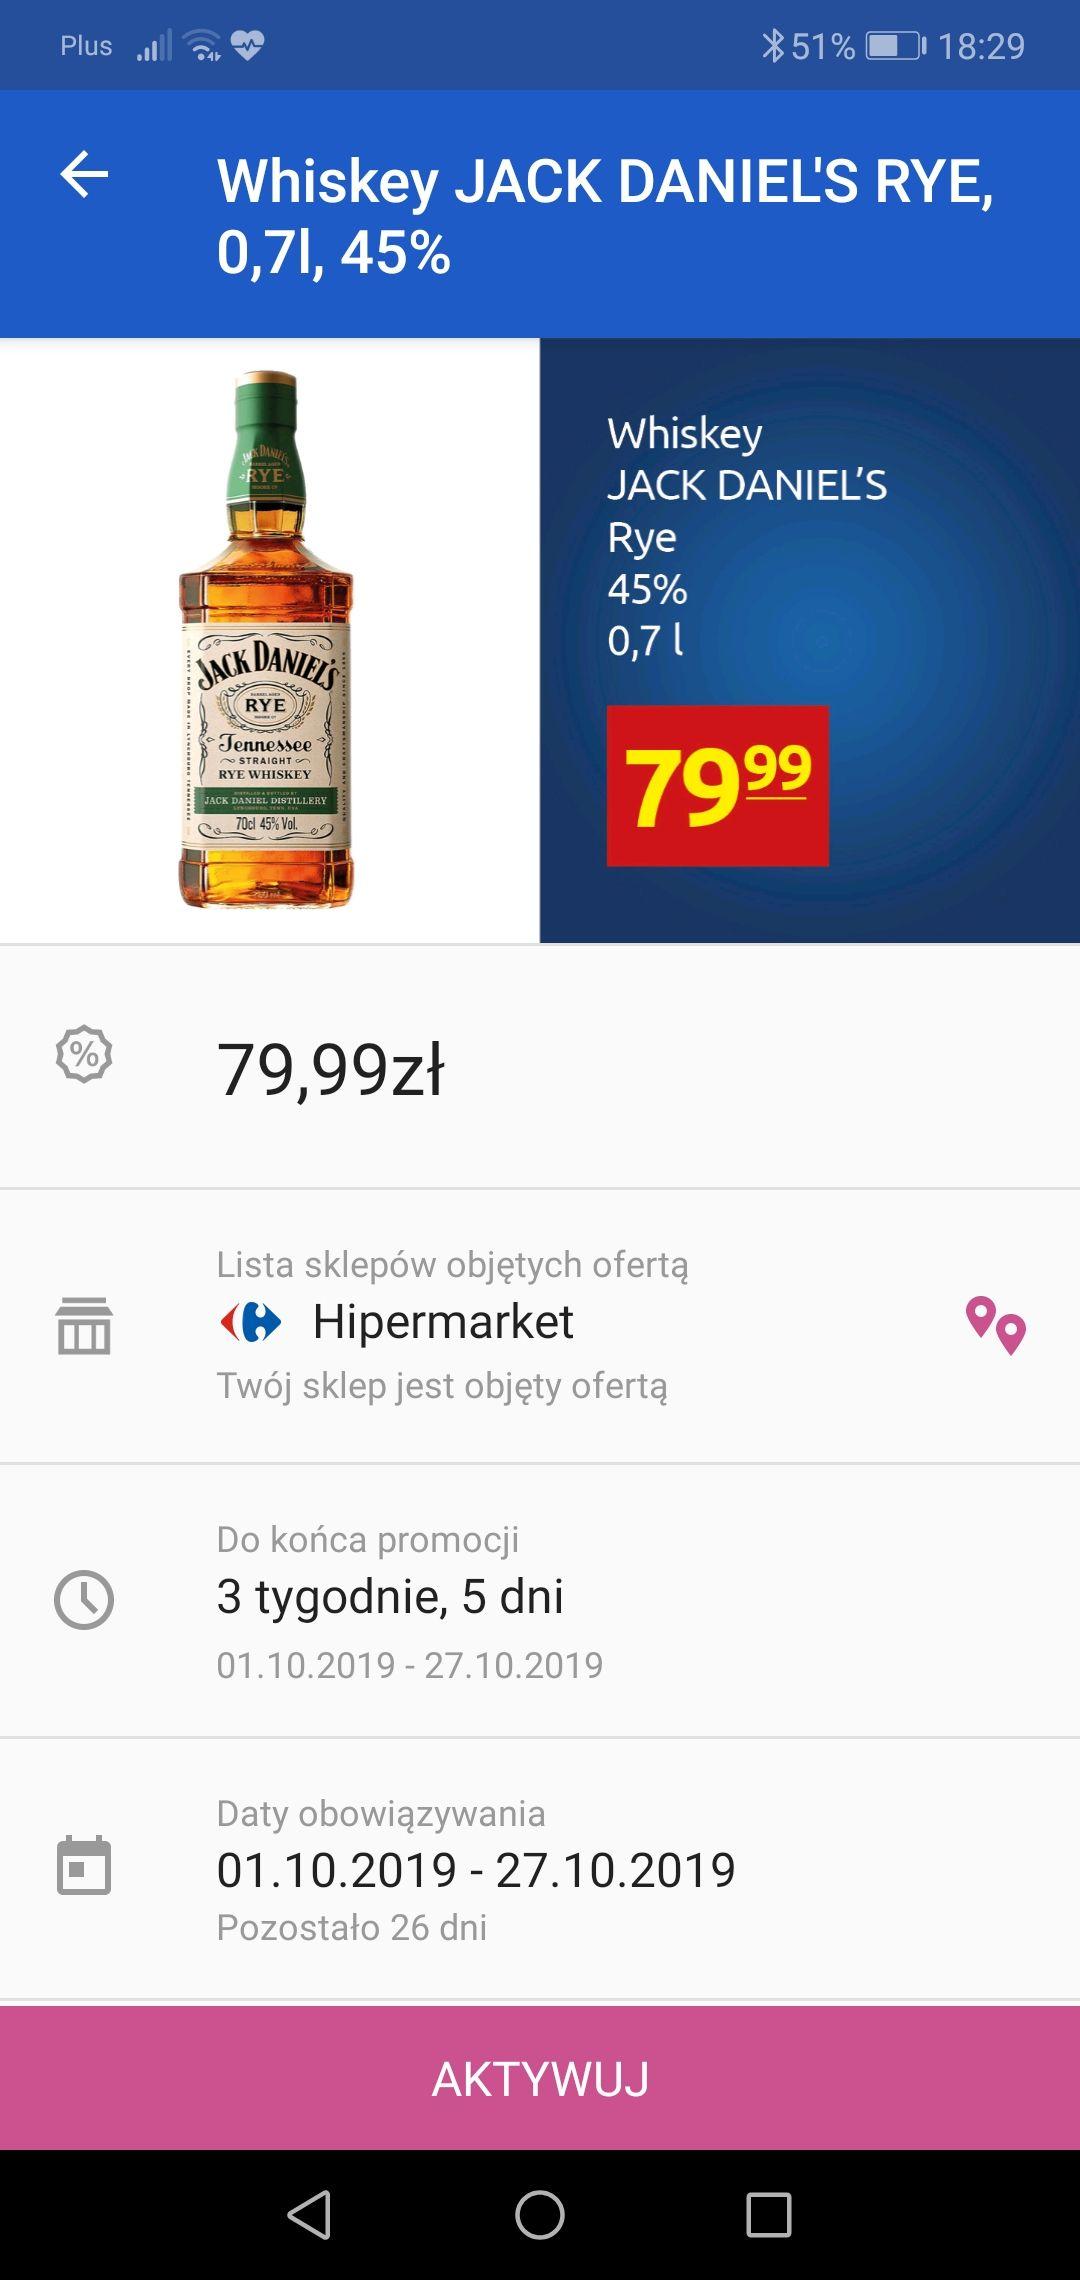 Whiskey Jack Daniel's Rye 0,7l - Carrefour